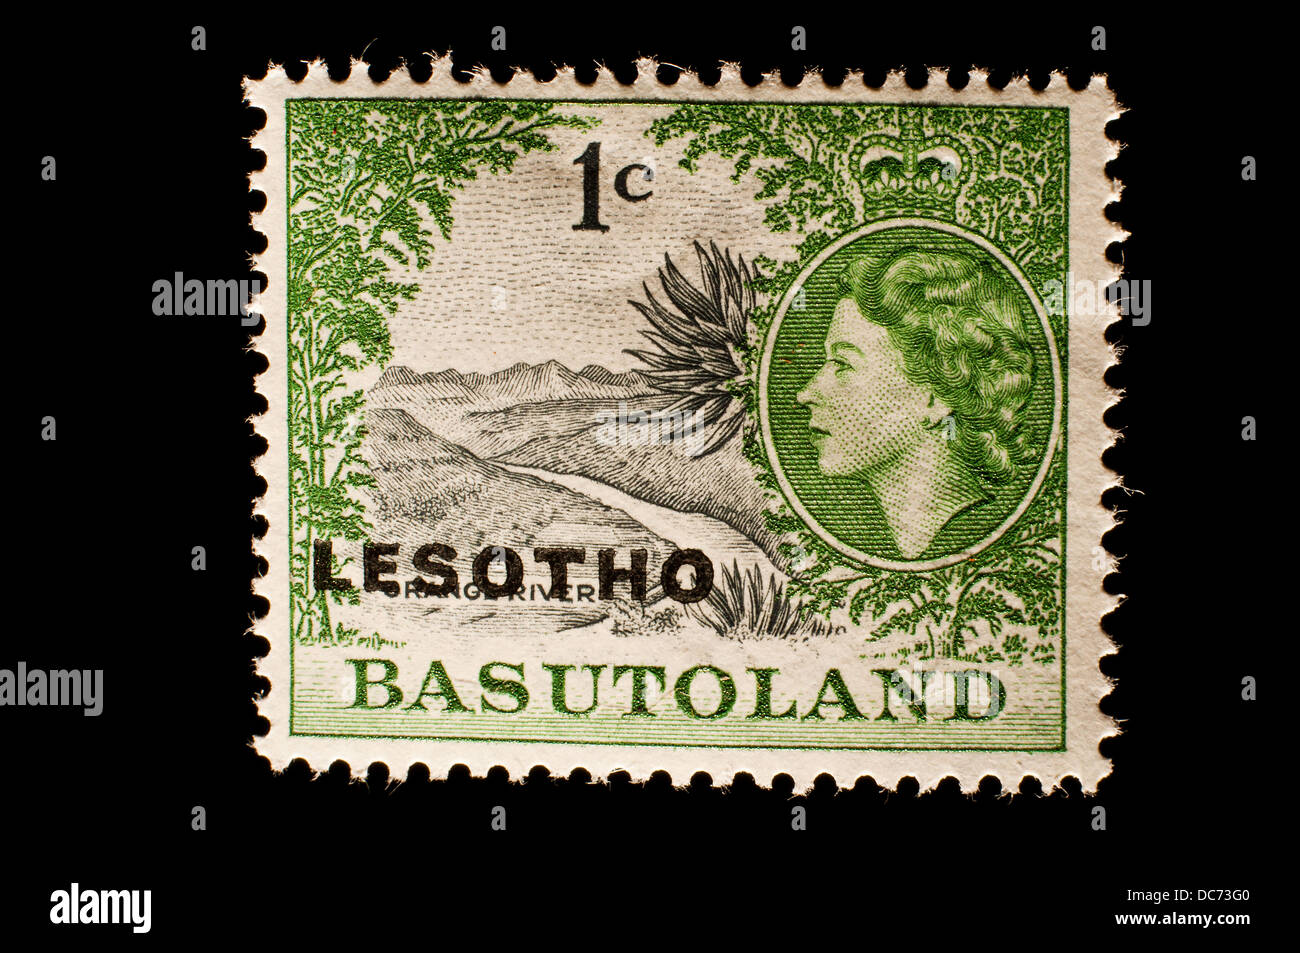 Lesotho Basutoland postage stamp - Stock Image